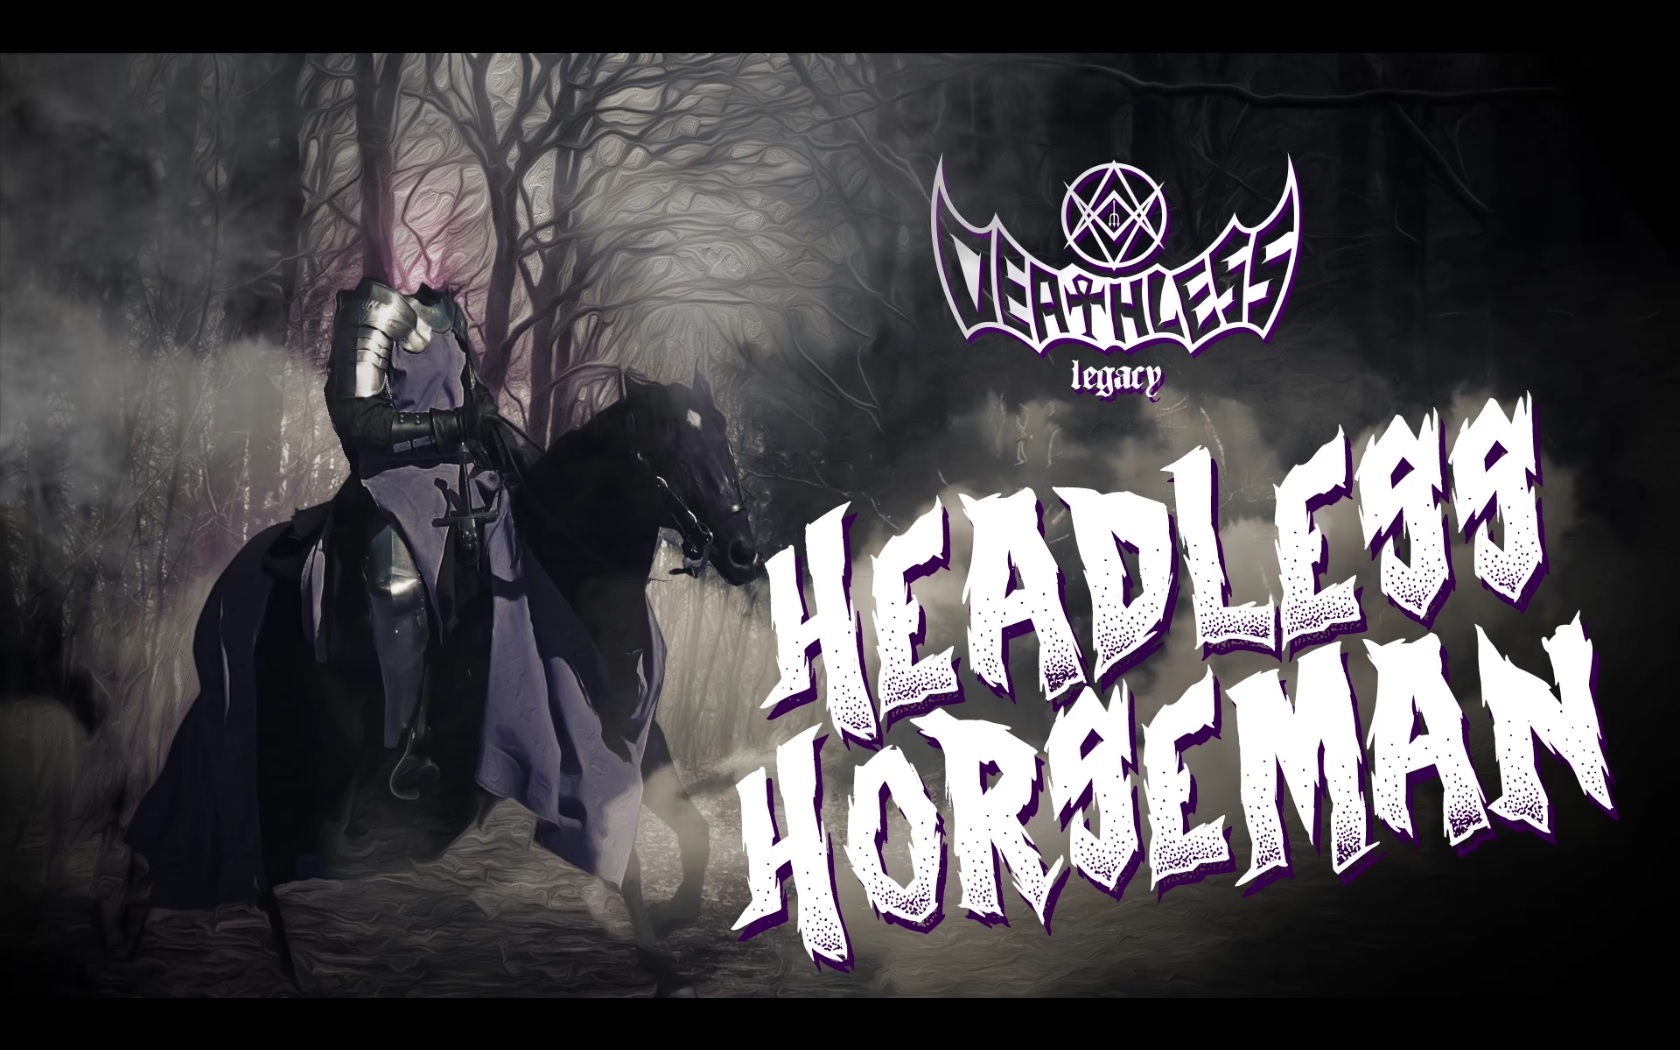 deathless legacy headless horseman